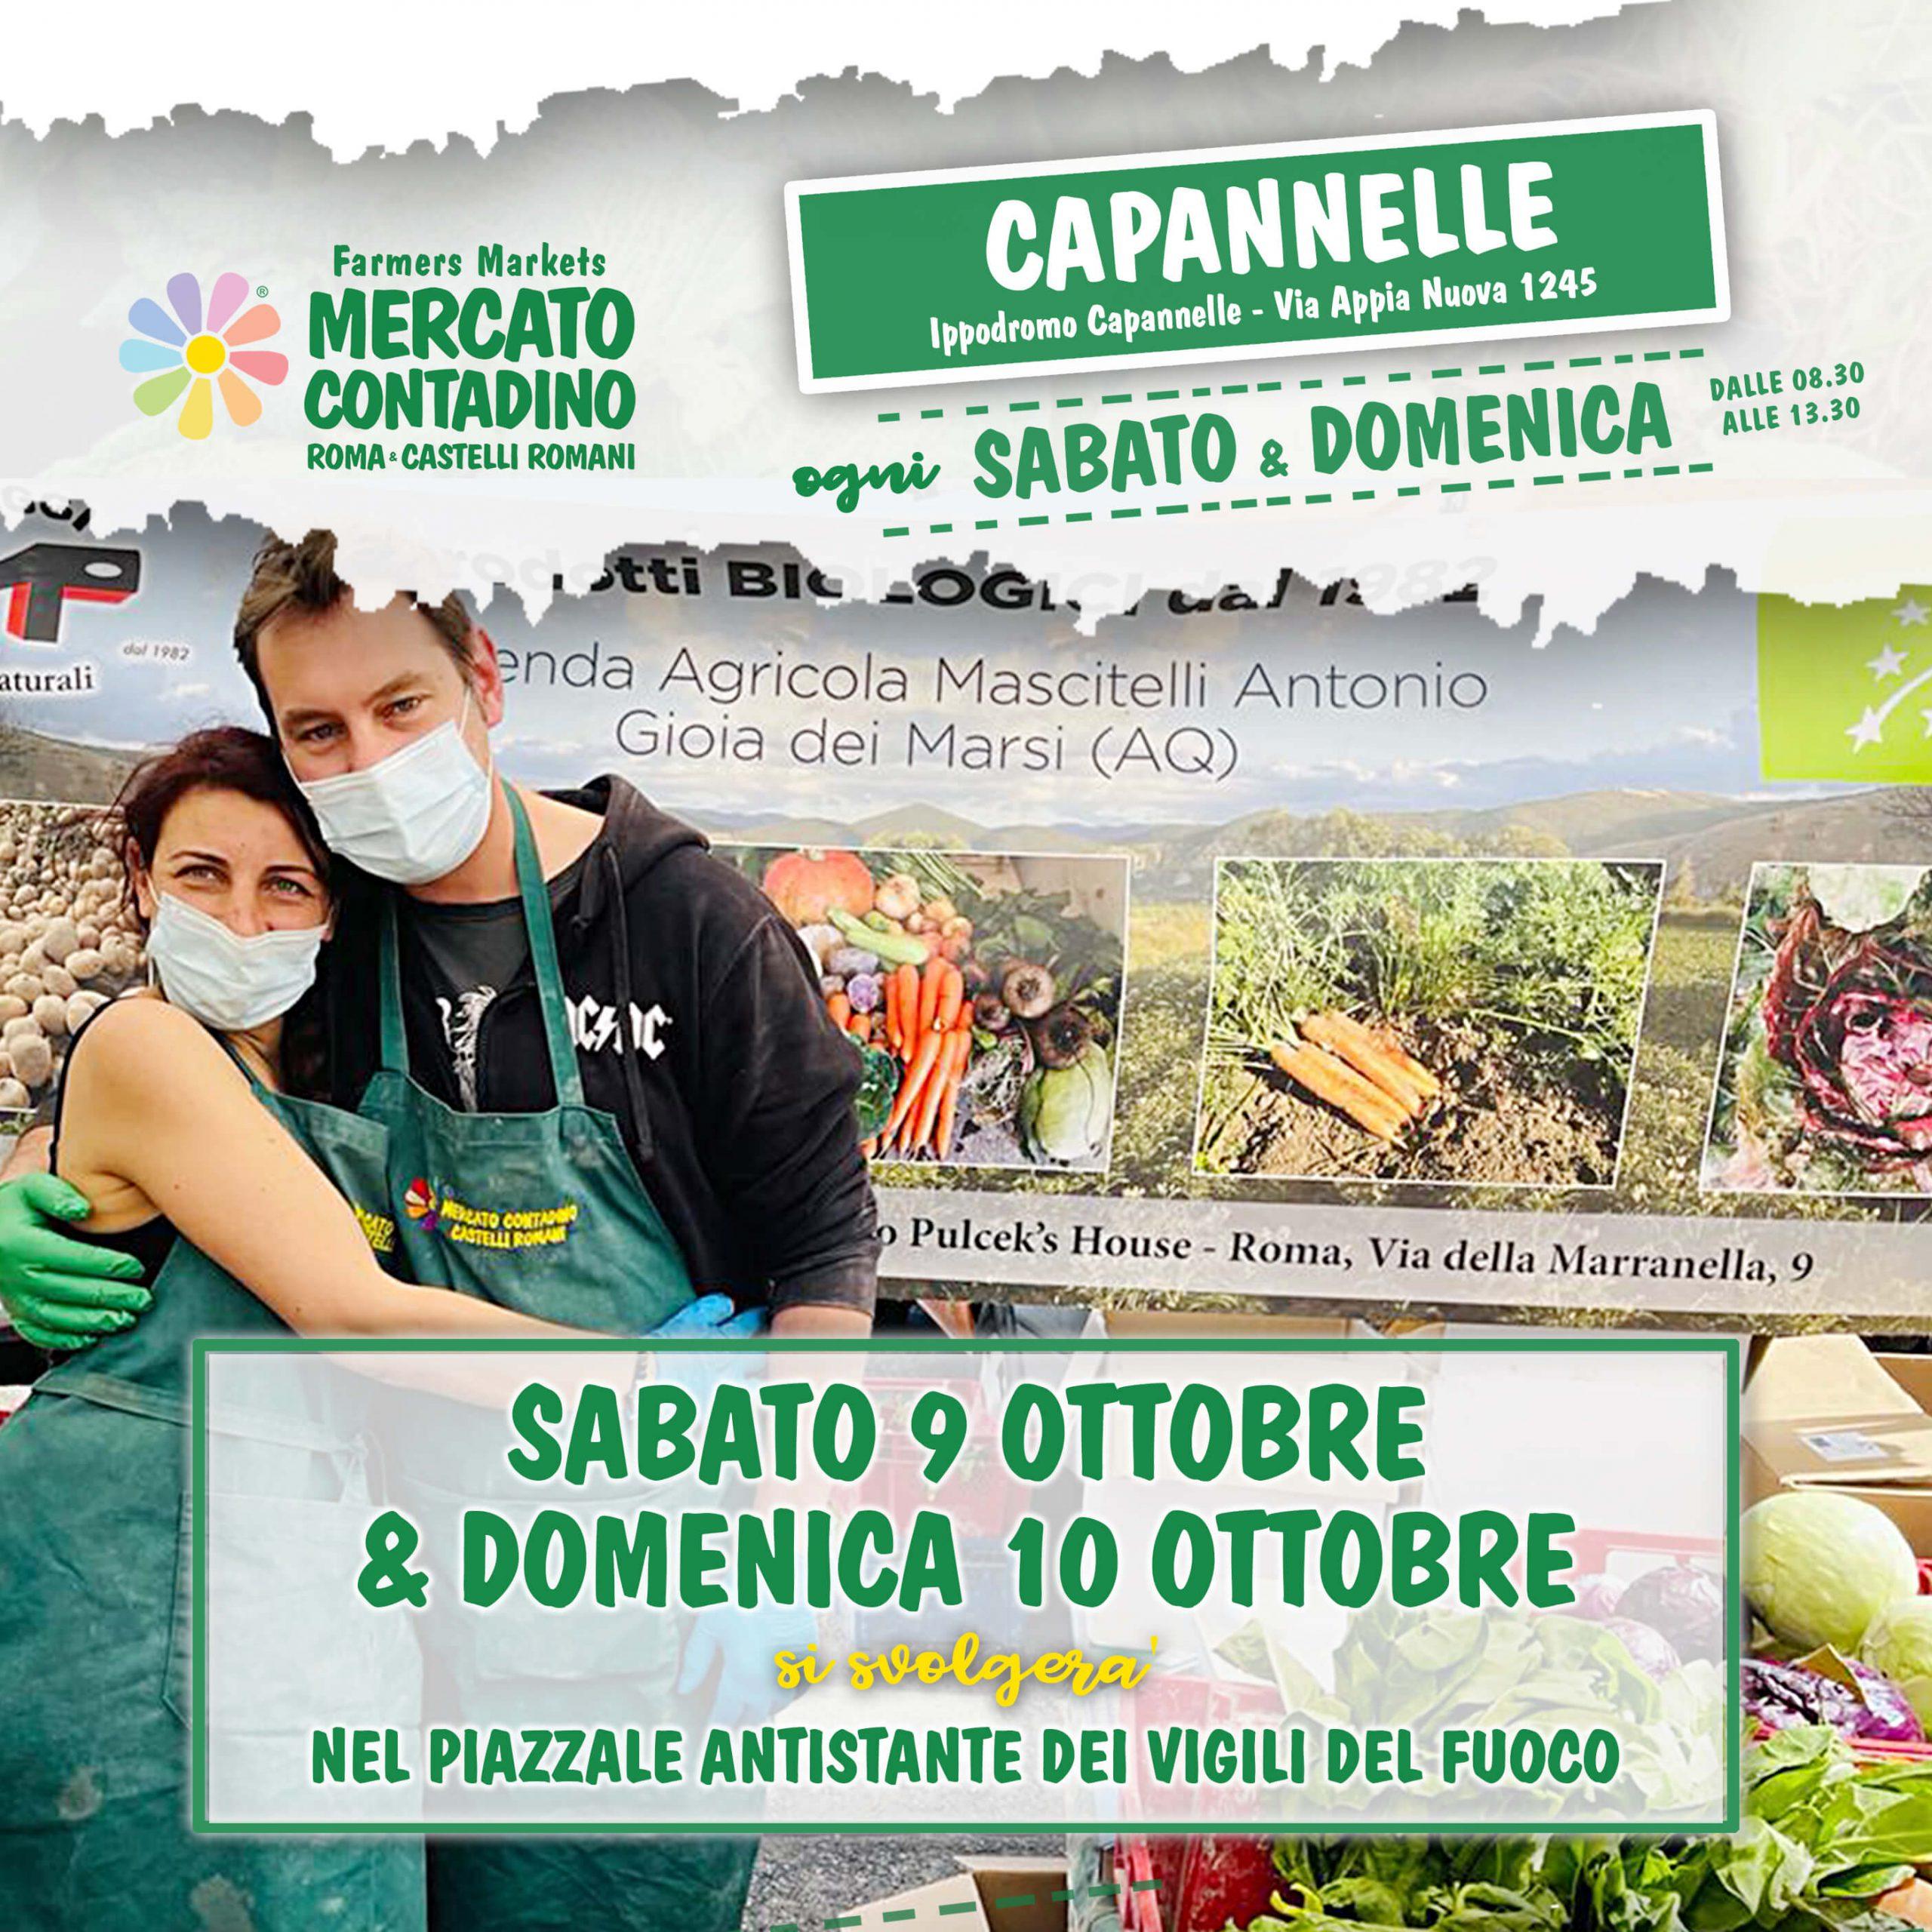 capannelle mercato contadino 2021